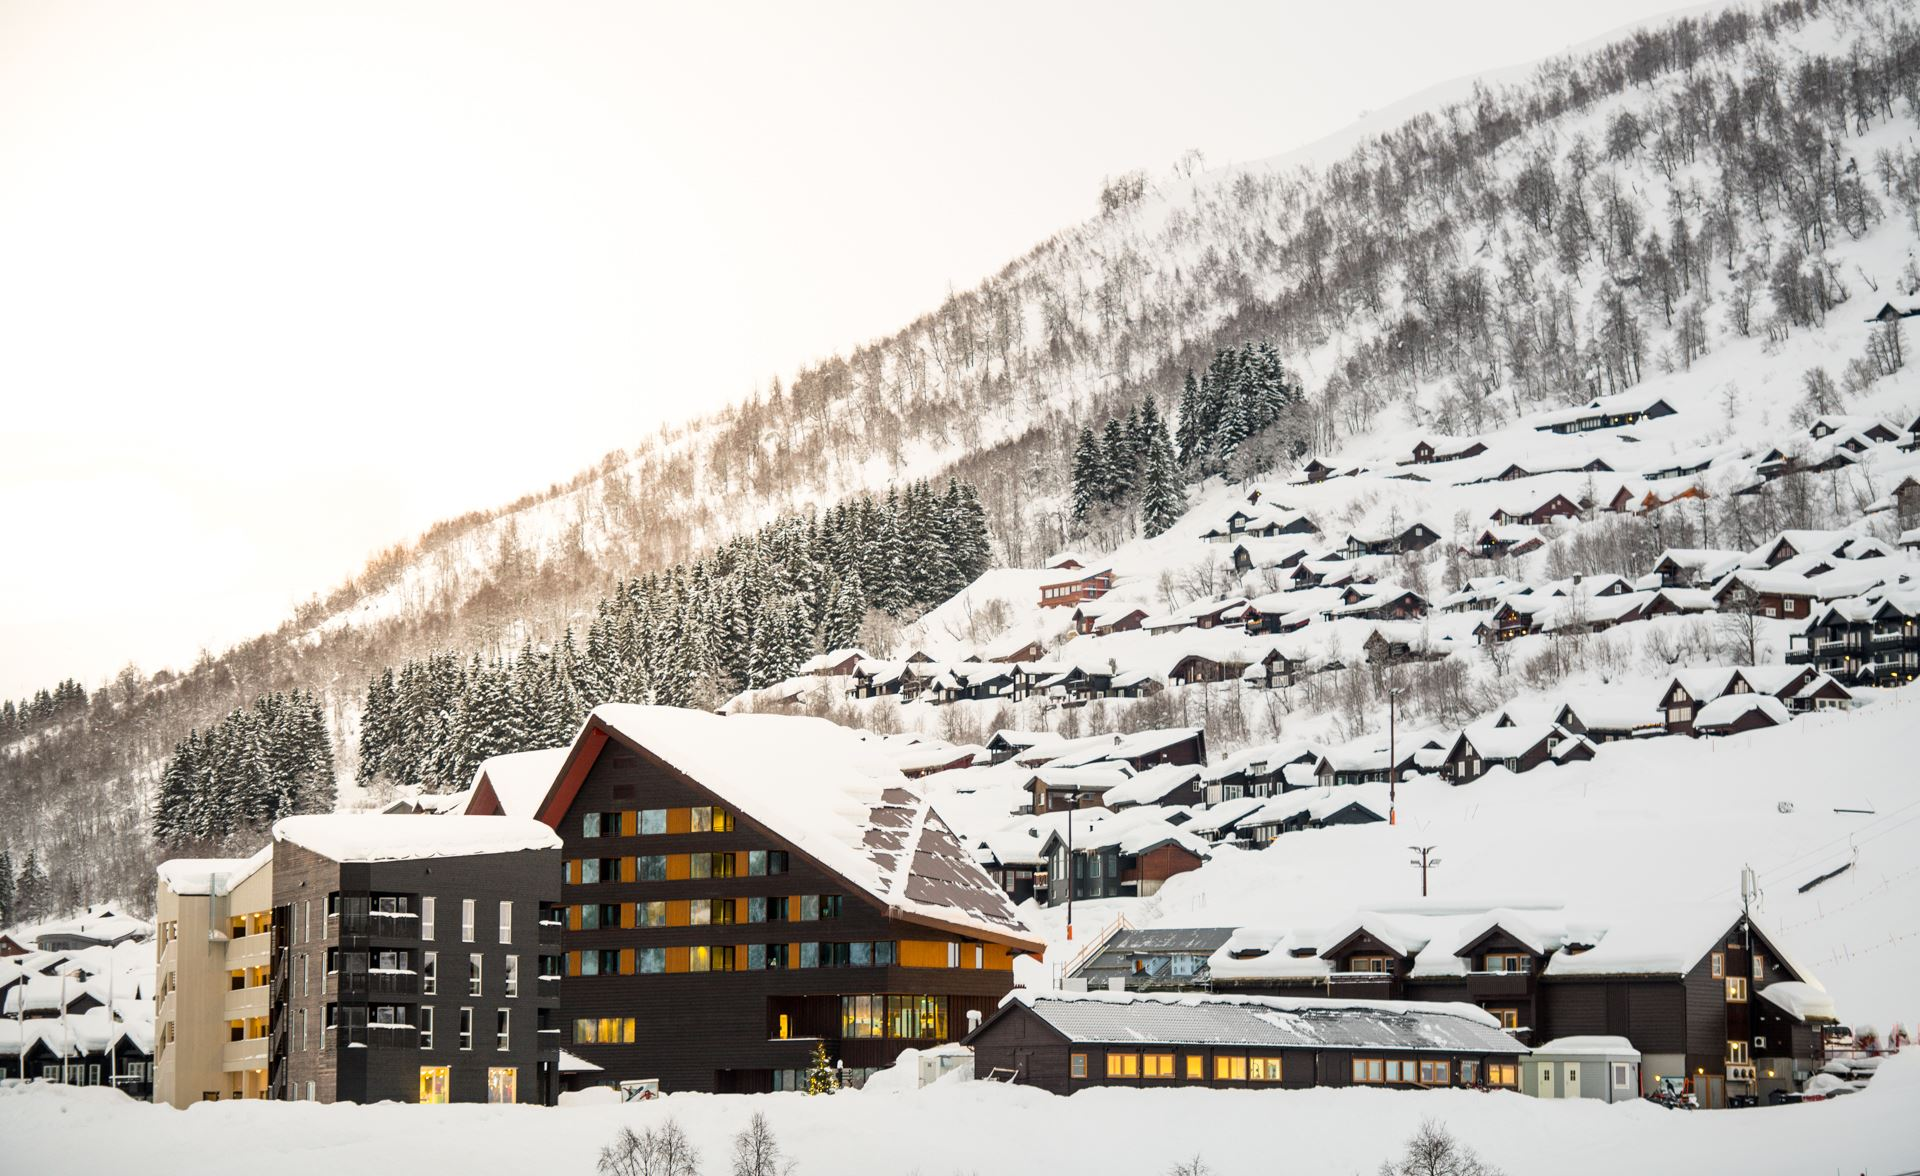 Sverre Hjørnevik - 18, The magical snow & fjord experience